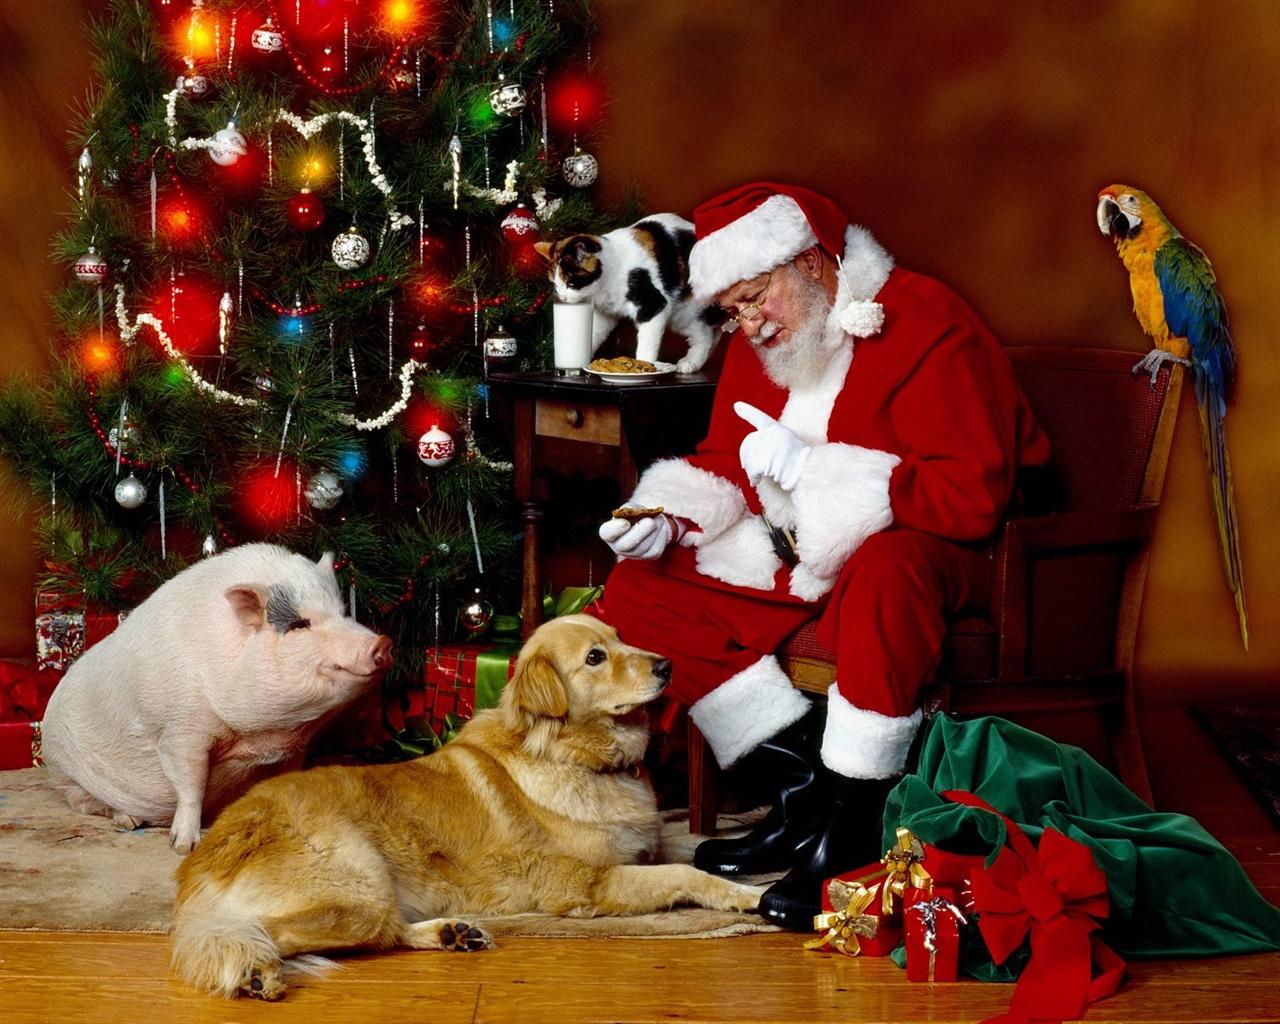 Christmas santa claus